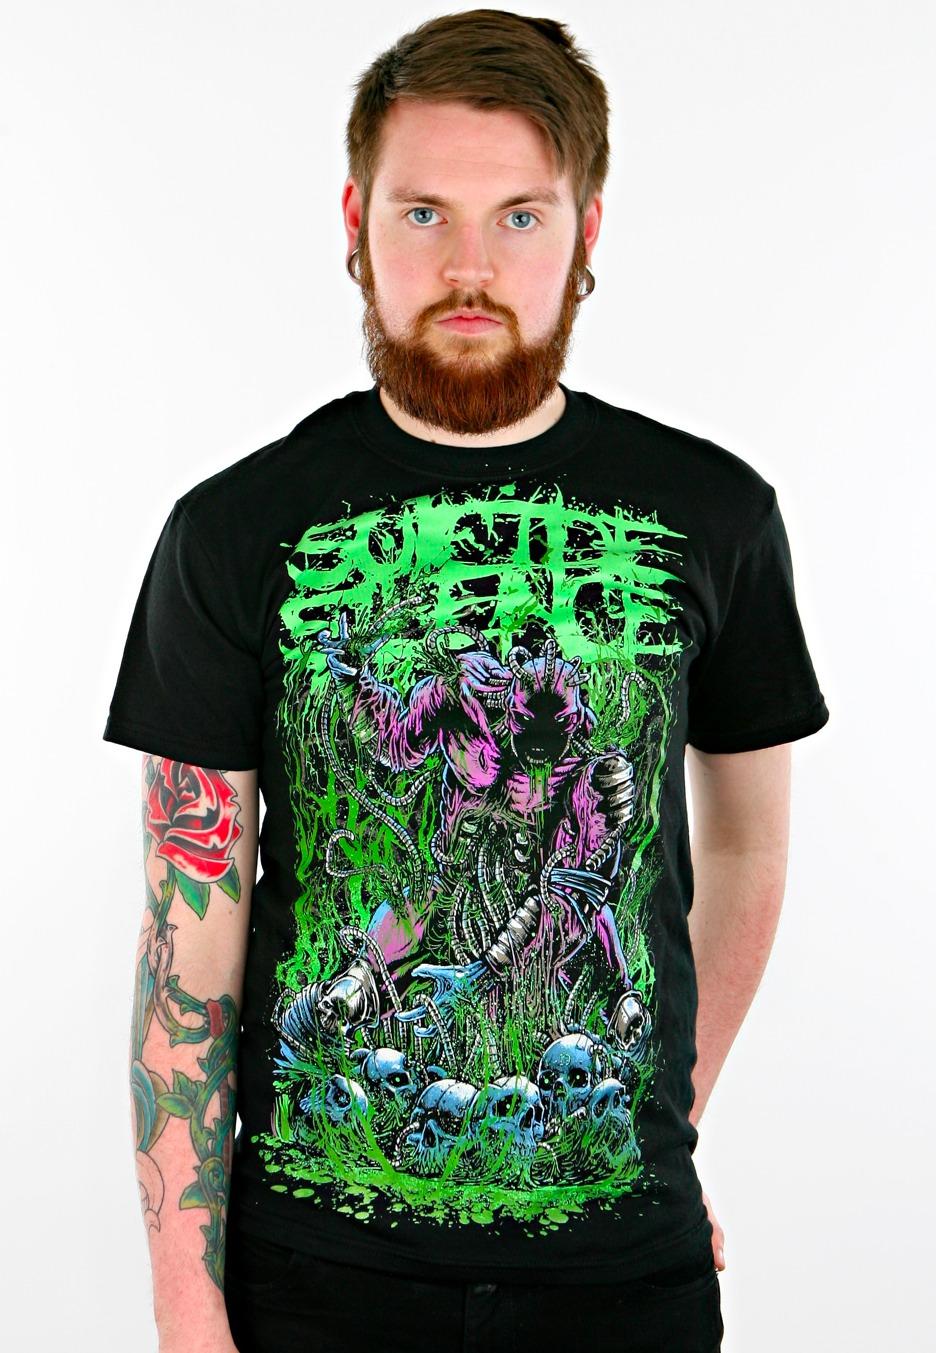 1b26ca6e8 Suicide Silence - Disengage - T-Shirt - Impericon.com Worldwide